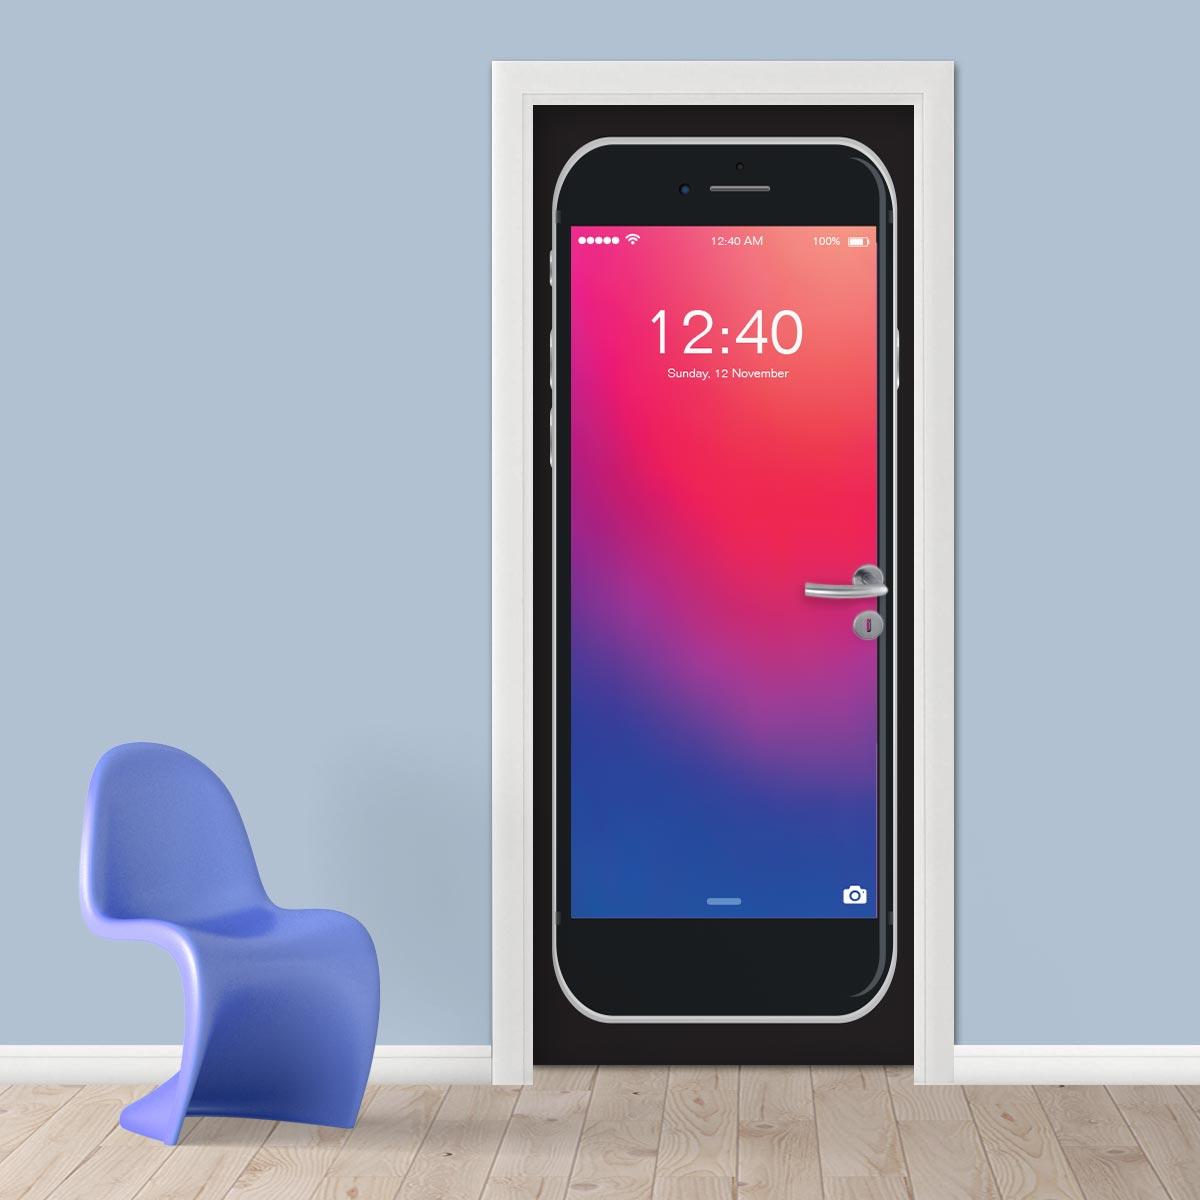 Adesivo (Sticker) Para Porta: Iphone Tela De Início